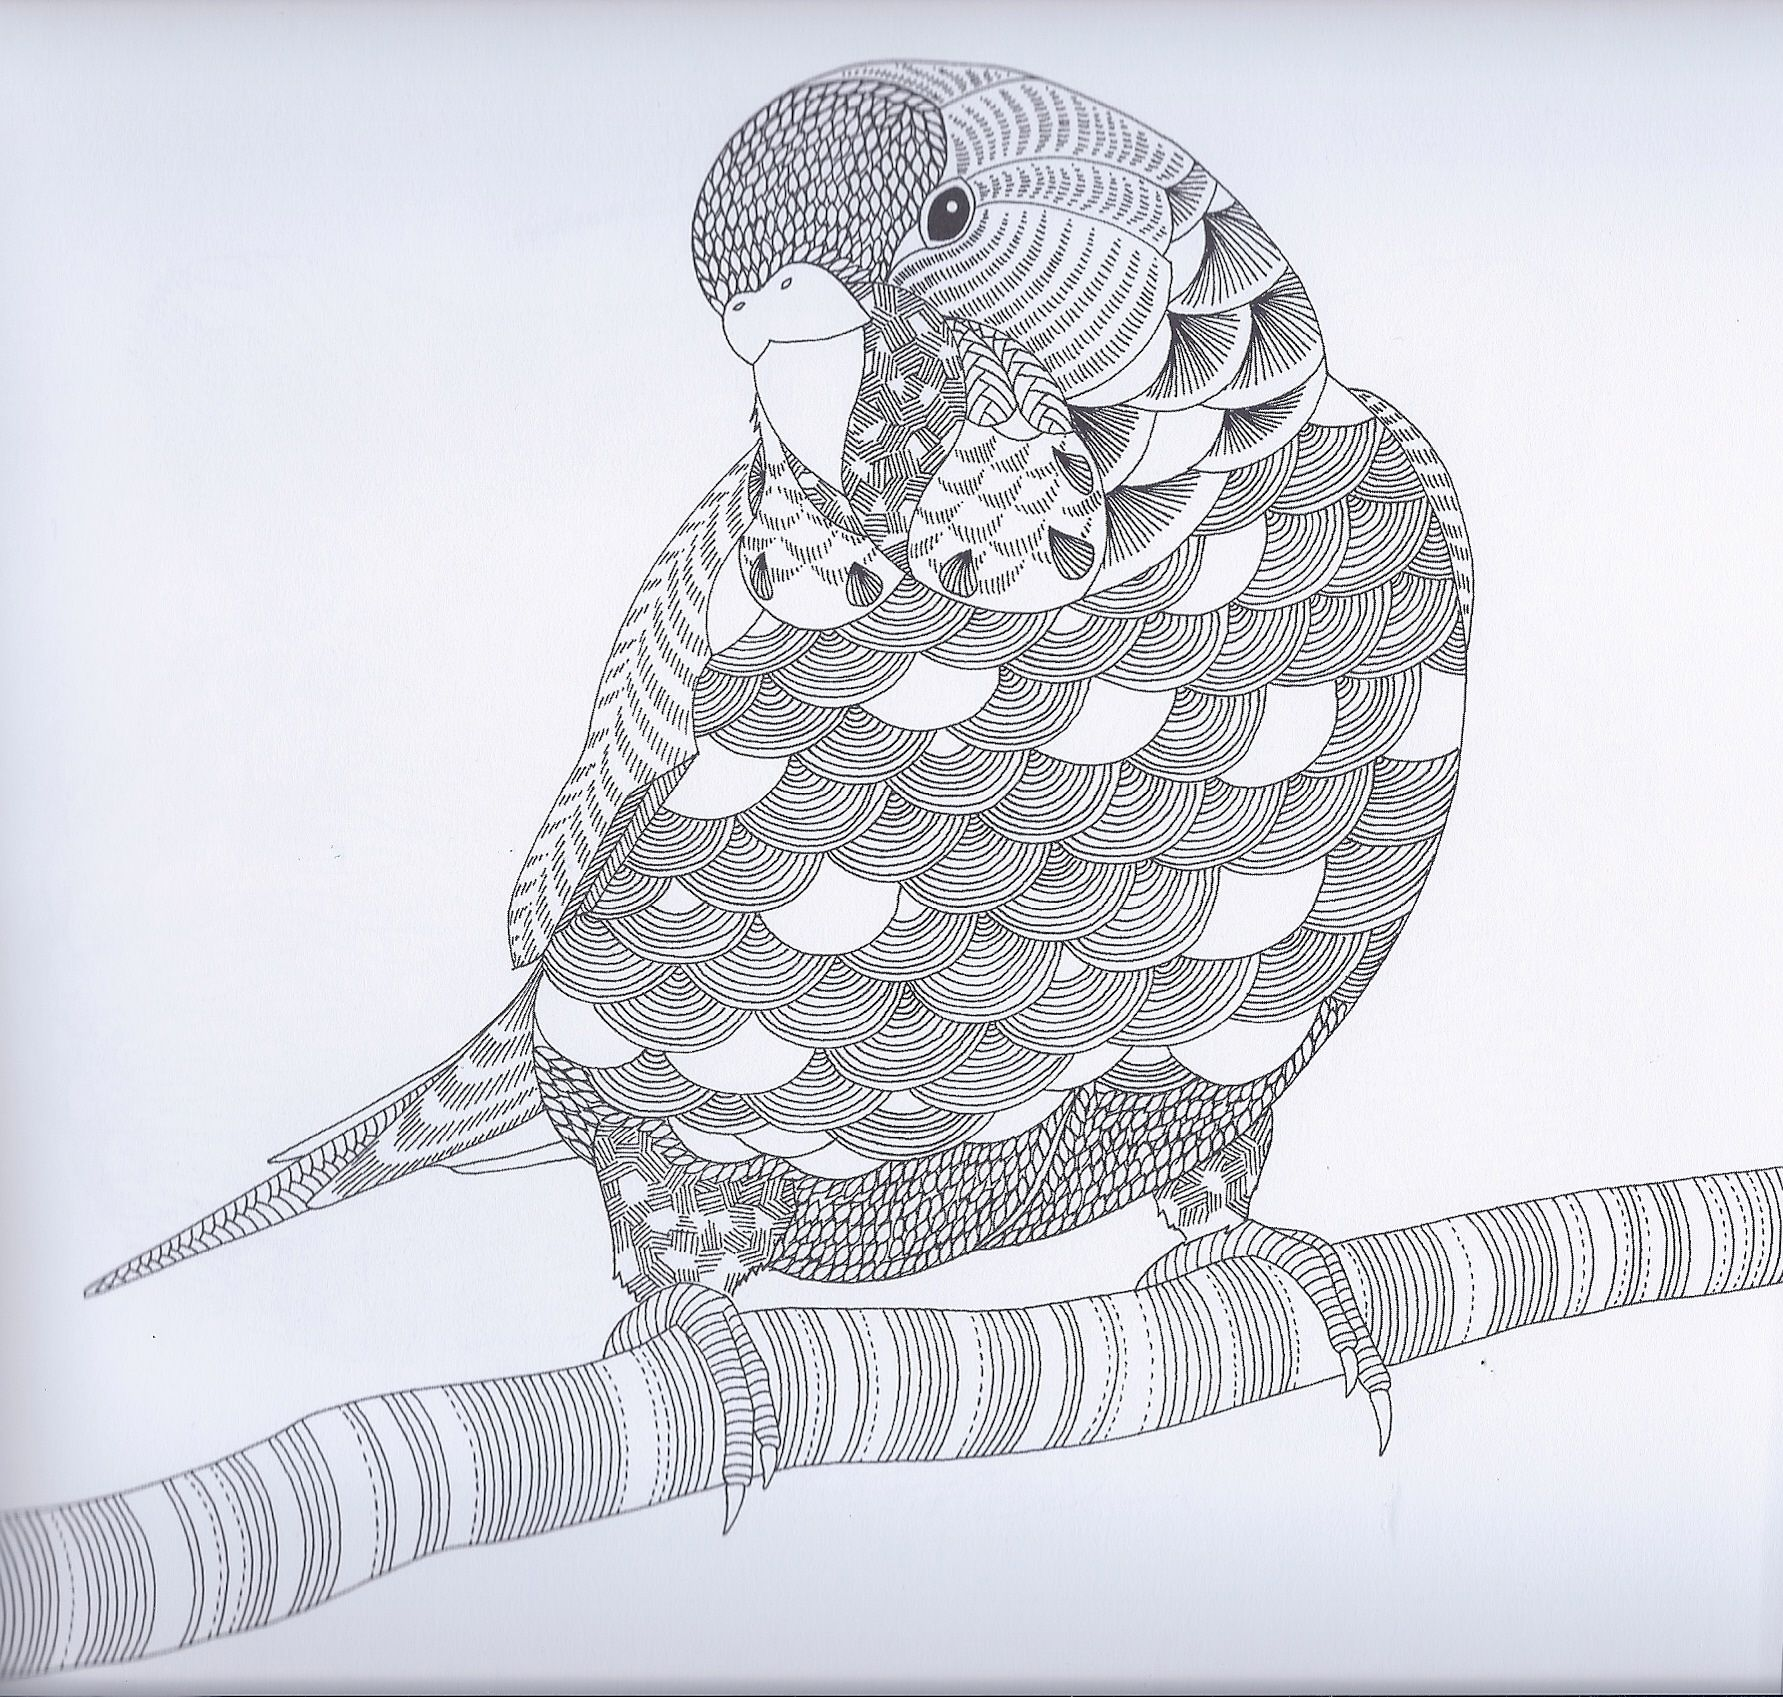 Parkiet Papagaai Parkiet Kleuren Zentangle